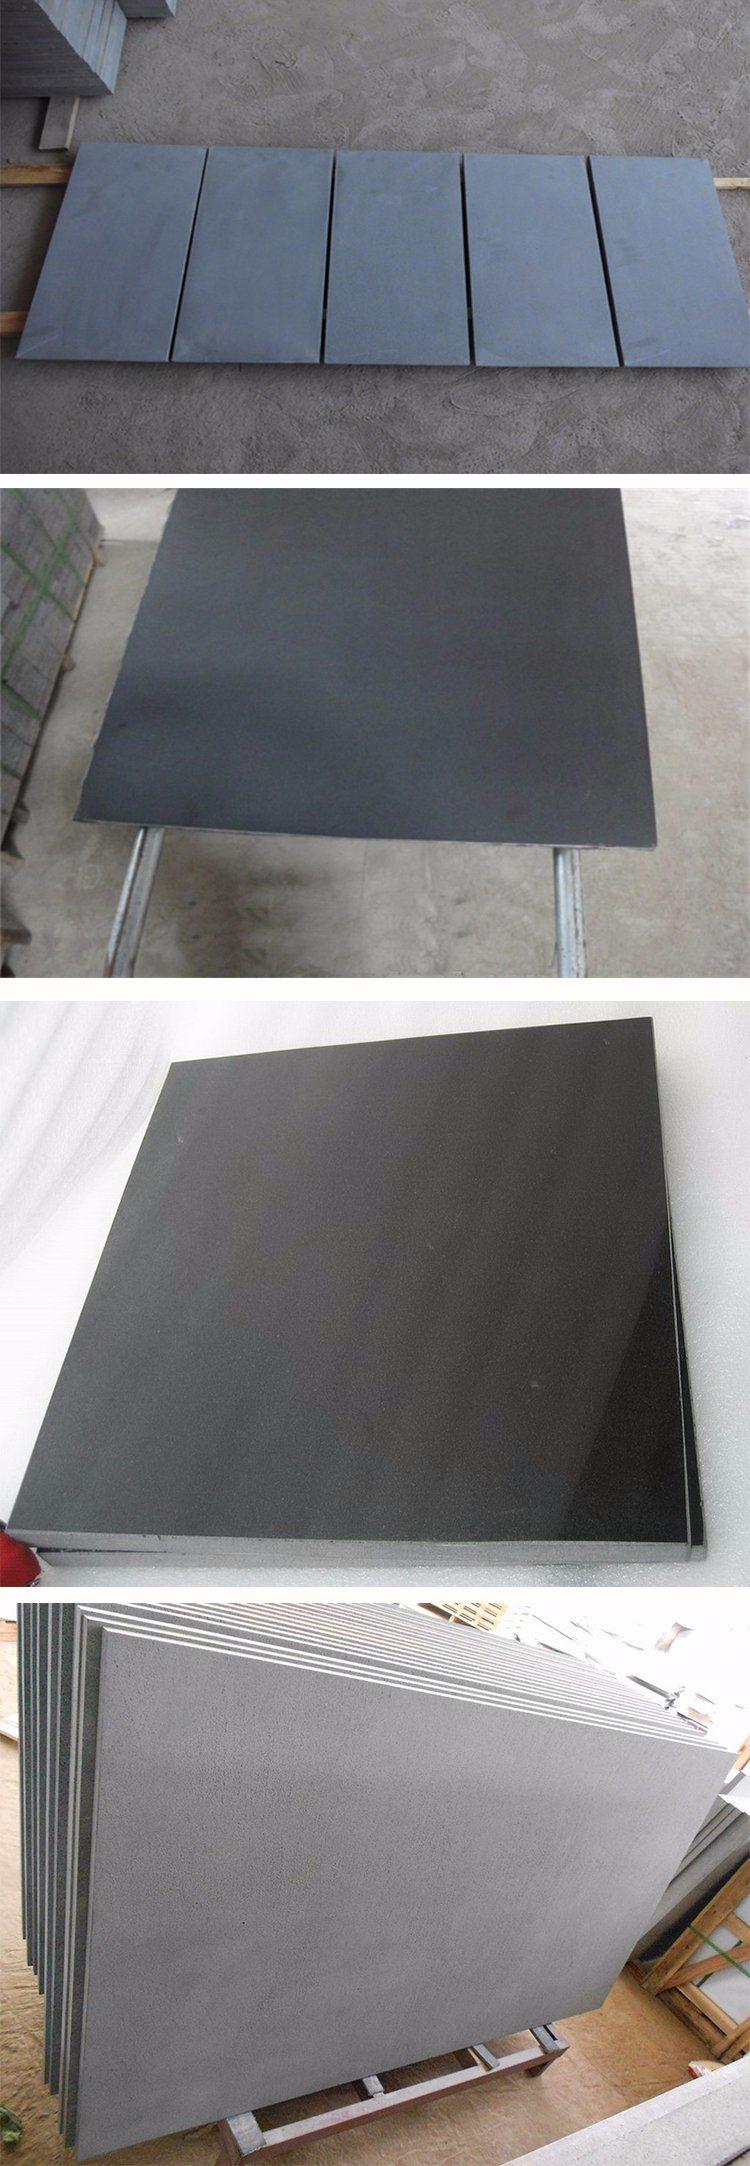 Polished Olivine Basalt Co : 운전사 포장 기계를 위한 자연적인 갈린 polished 현무암 청색 돌